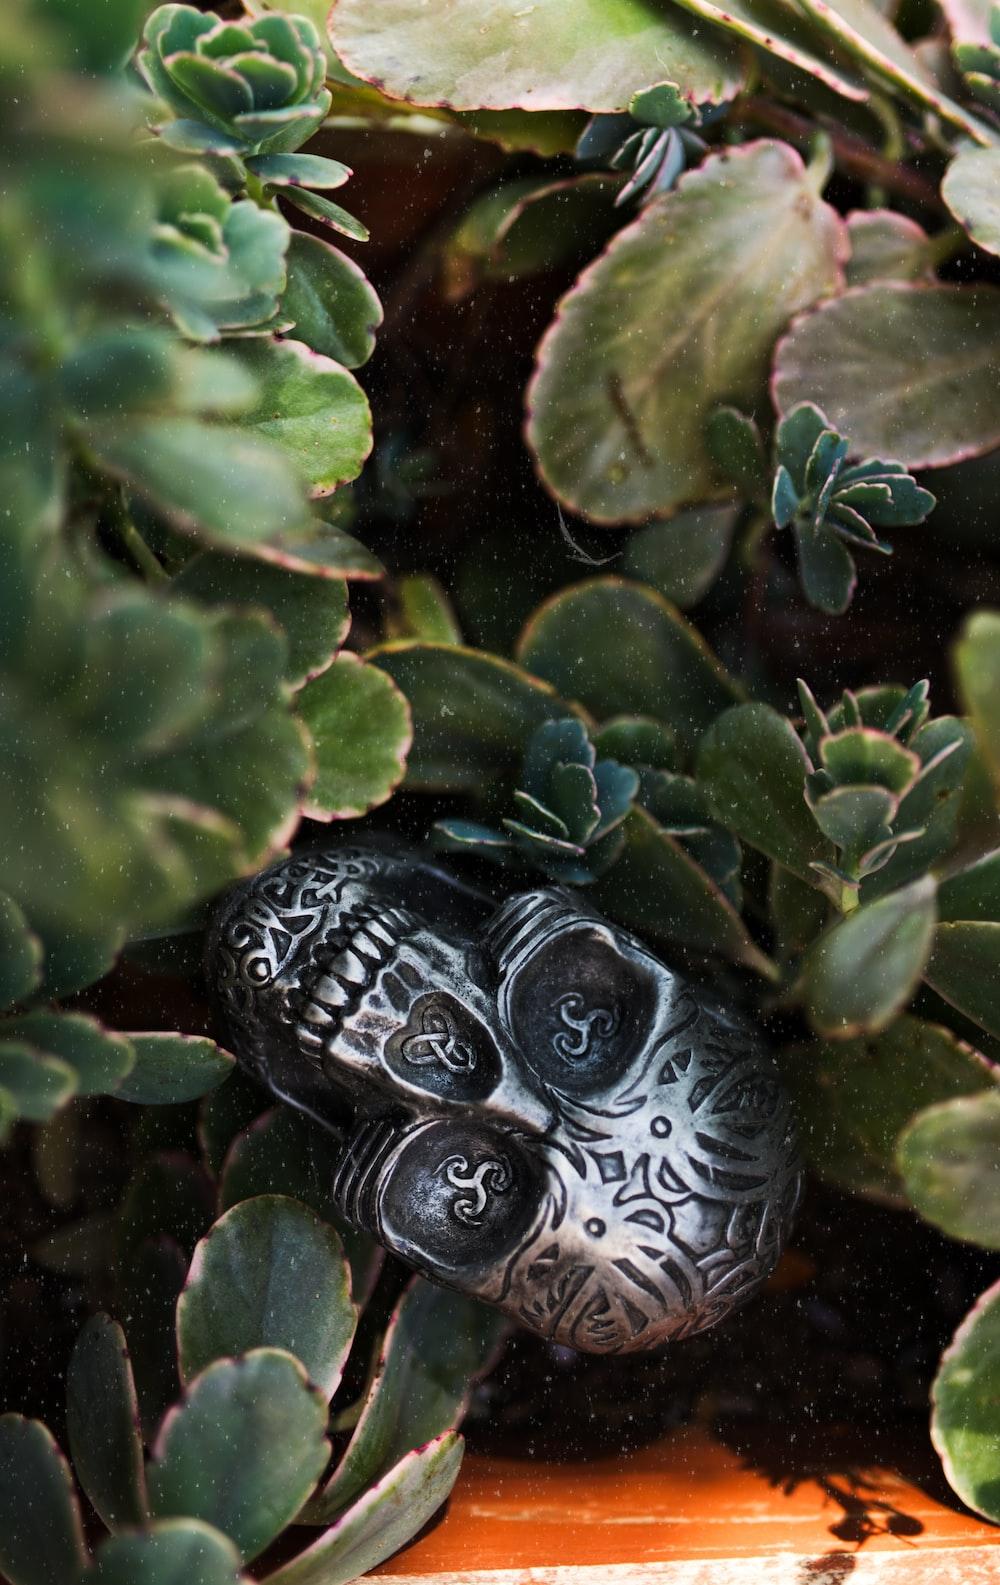 white and black skull ornament